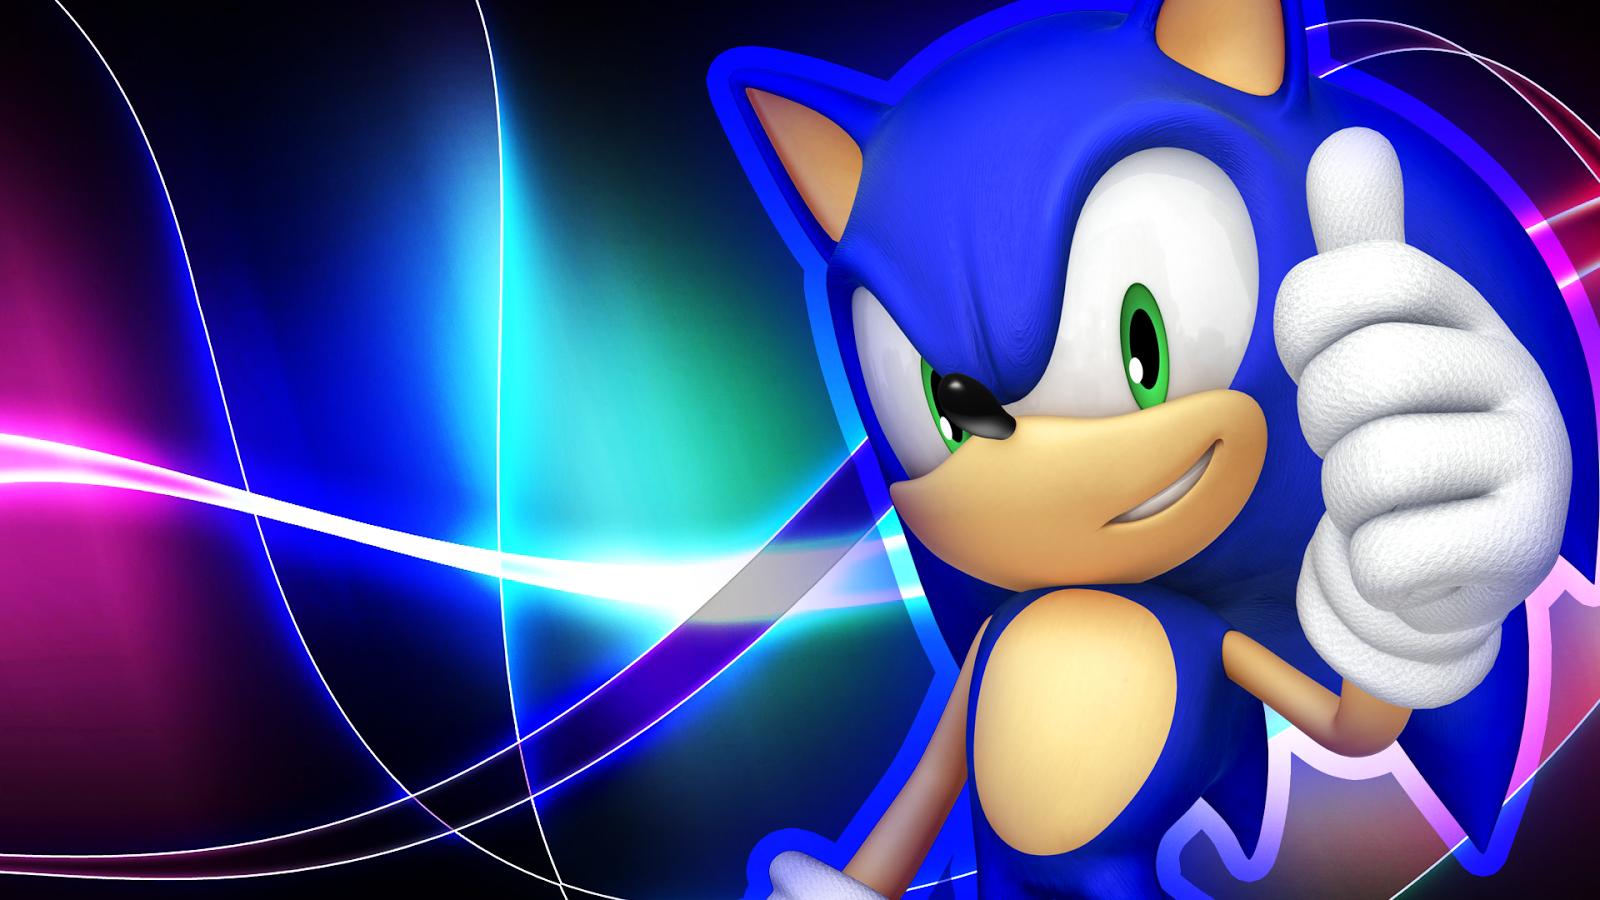 78 Sonic The Hedgehog Backgrounds On Wallpapersafari